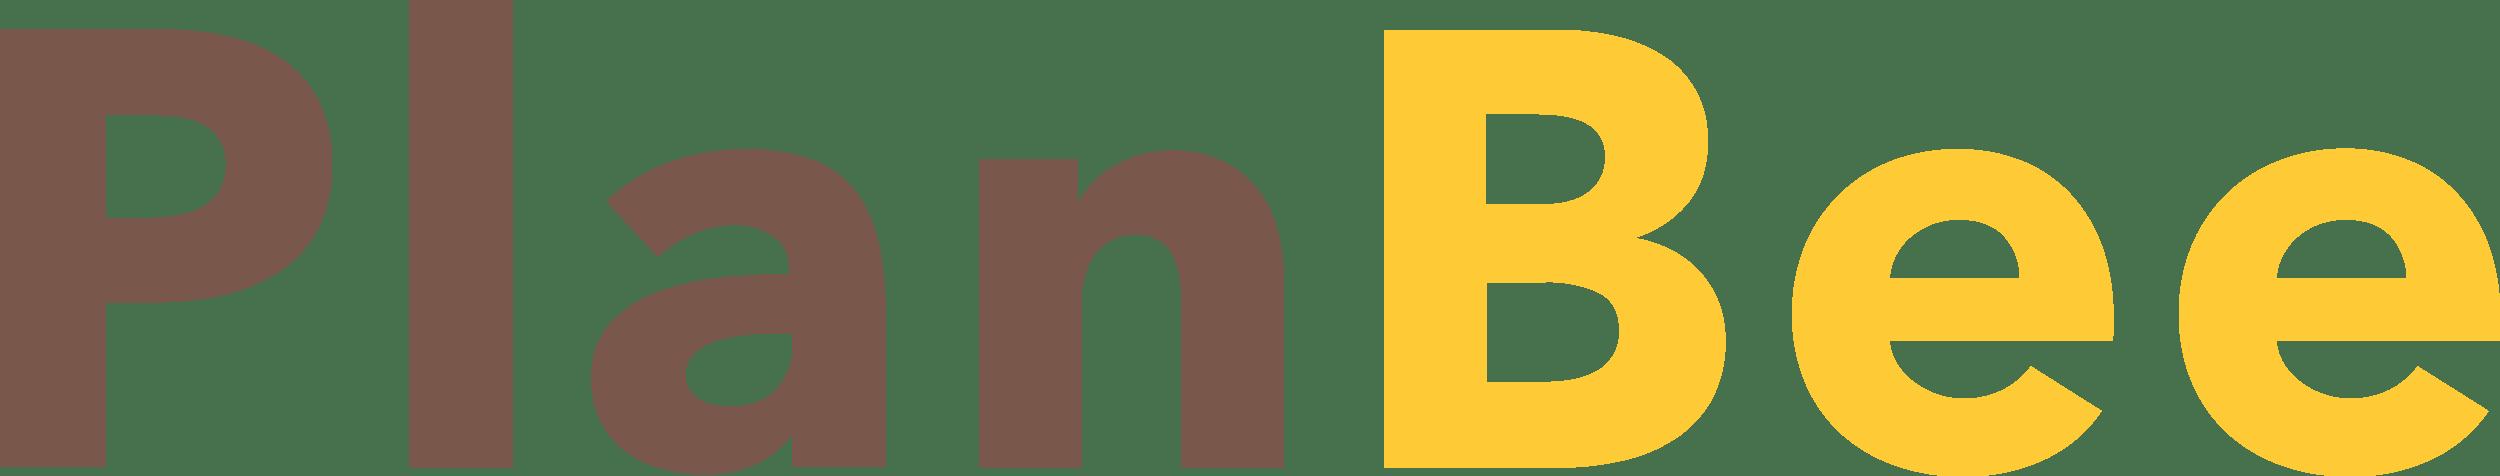 PlanBee-Project – Tools für Imker & Gärtner